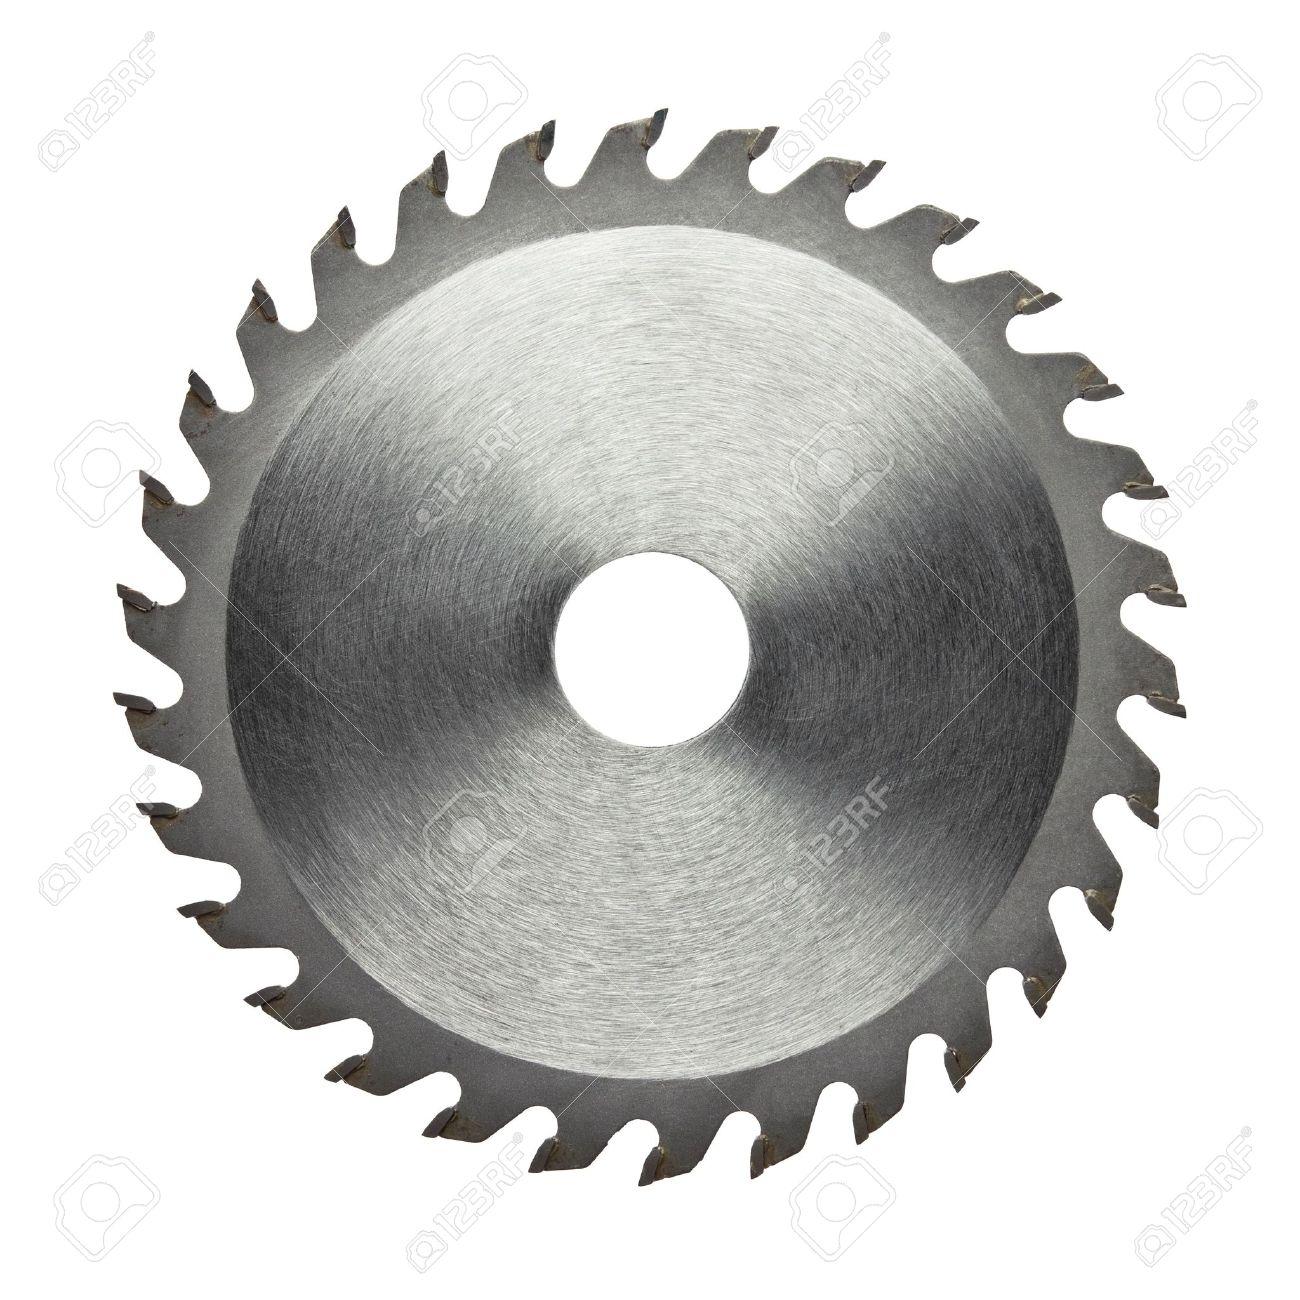 Circular saw blade clip art free.